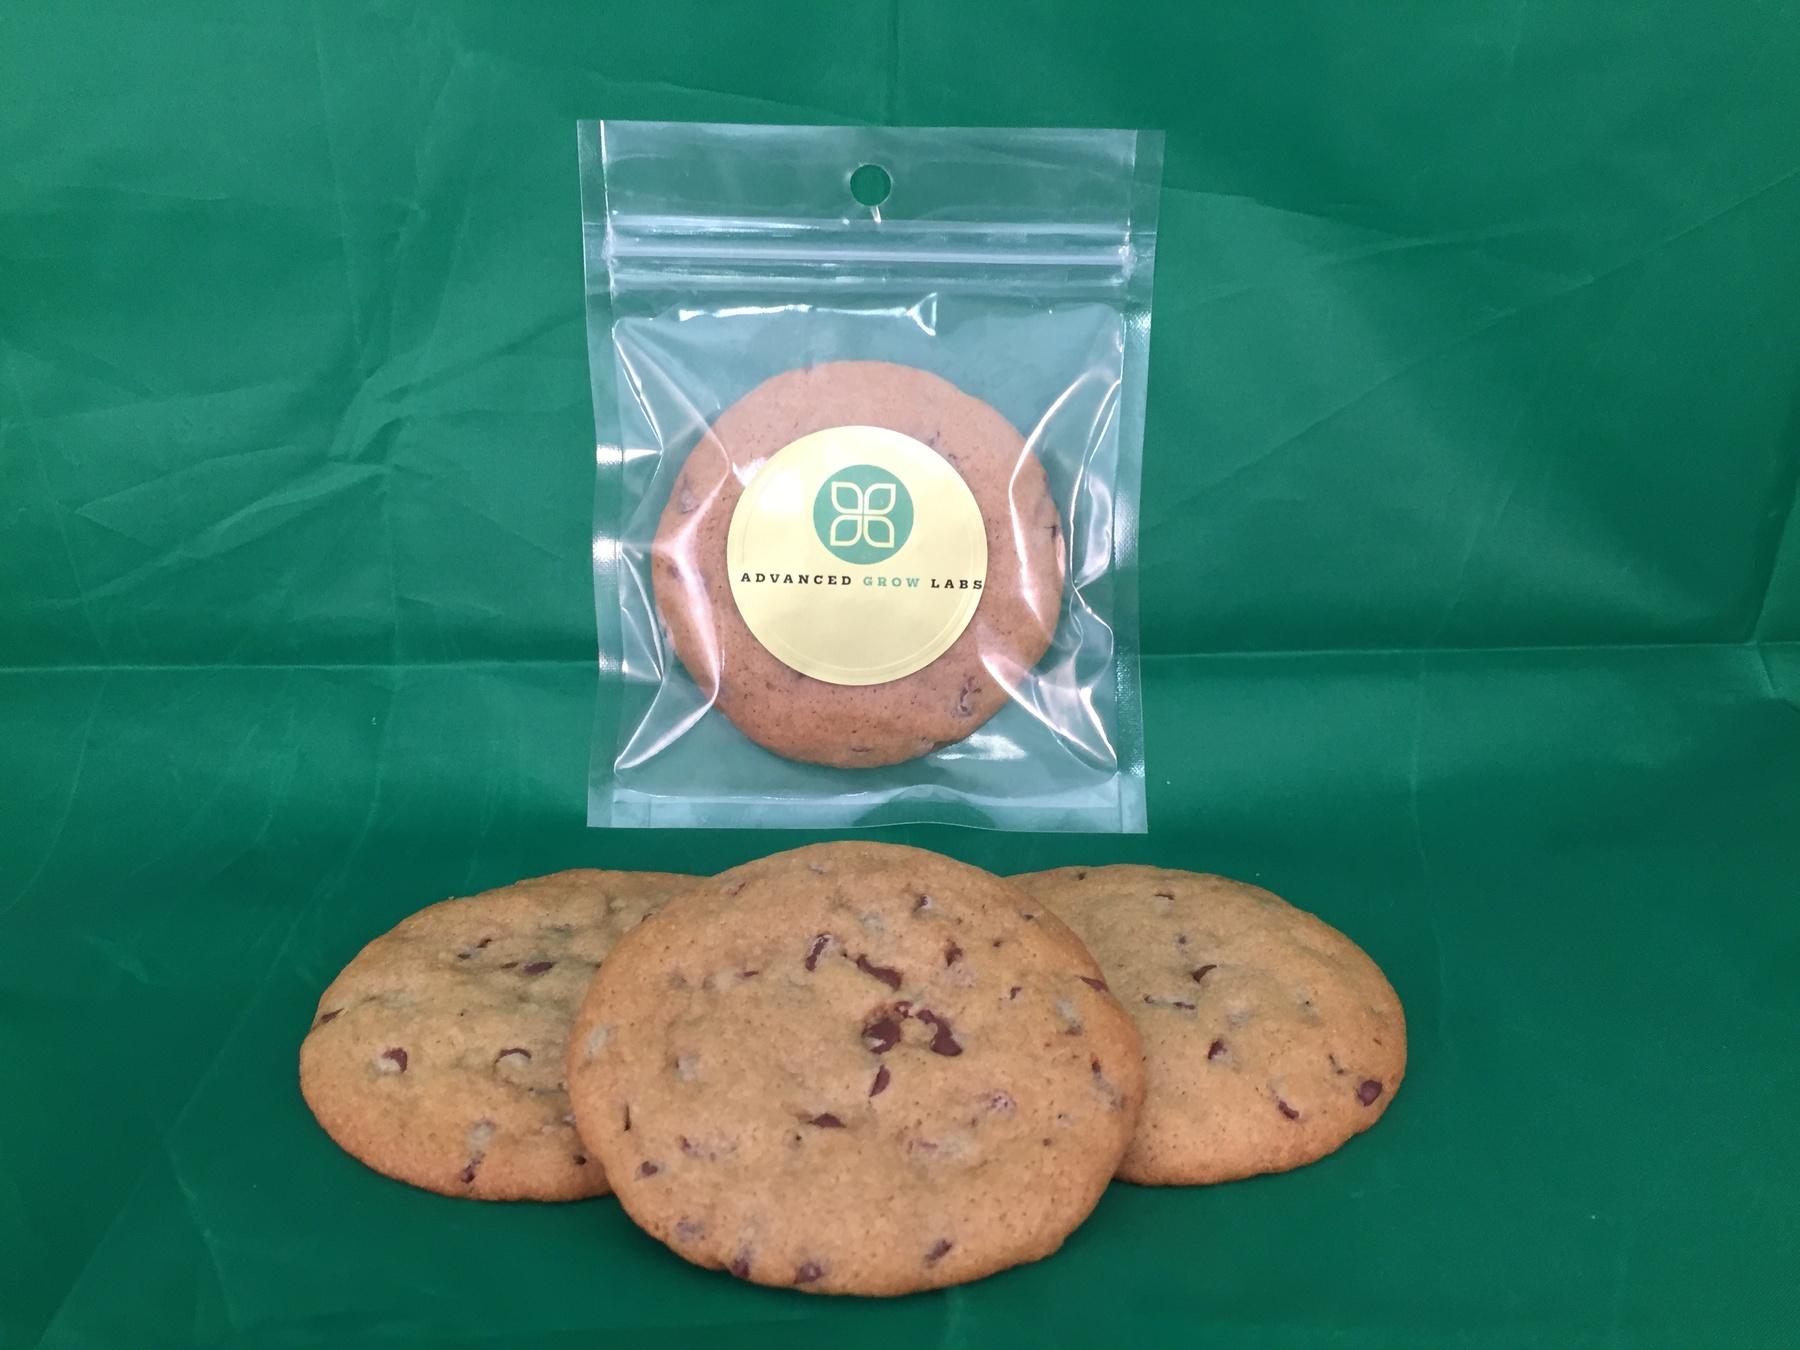 AGL Sativum 20 mg Peanut Butter Cookie Product image